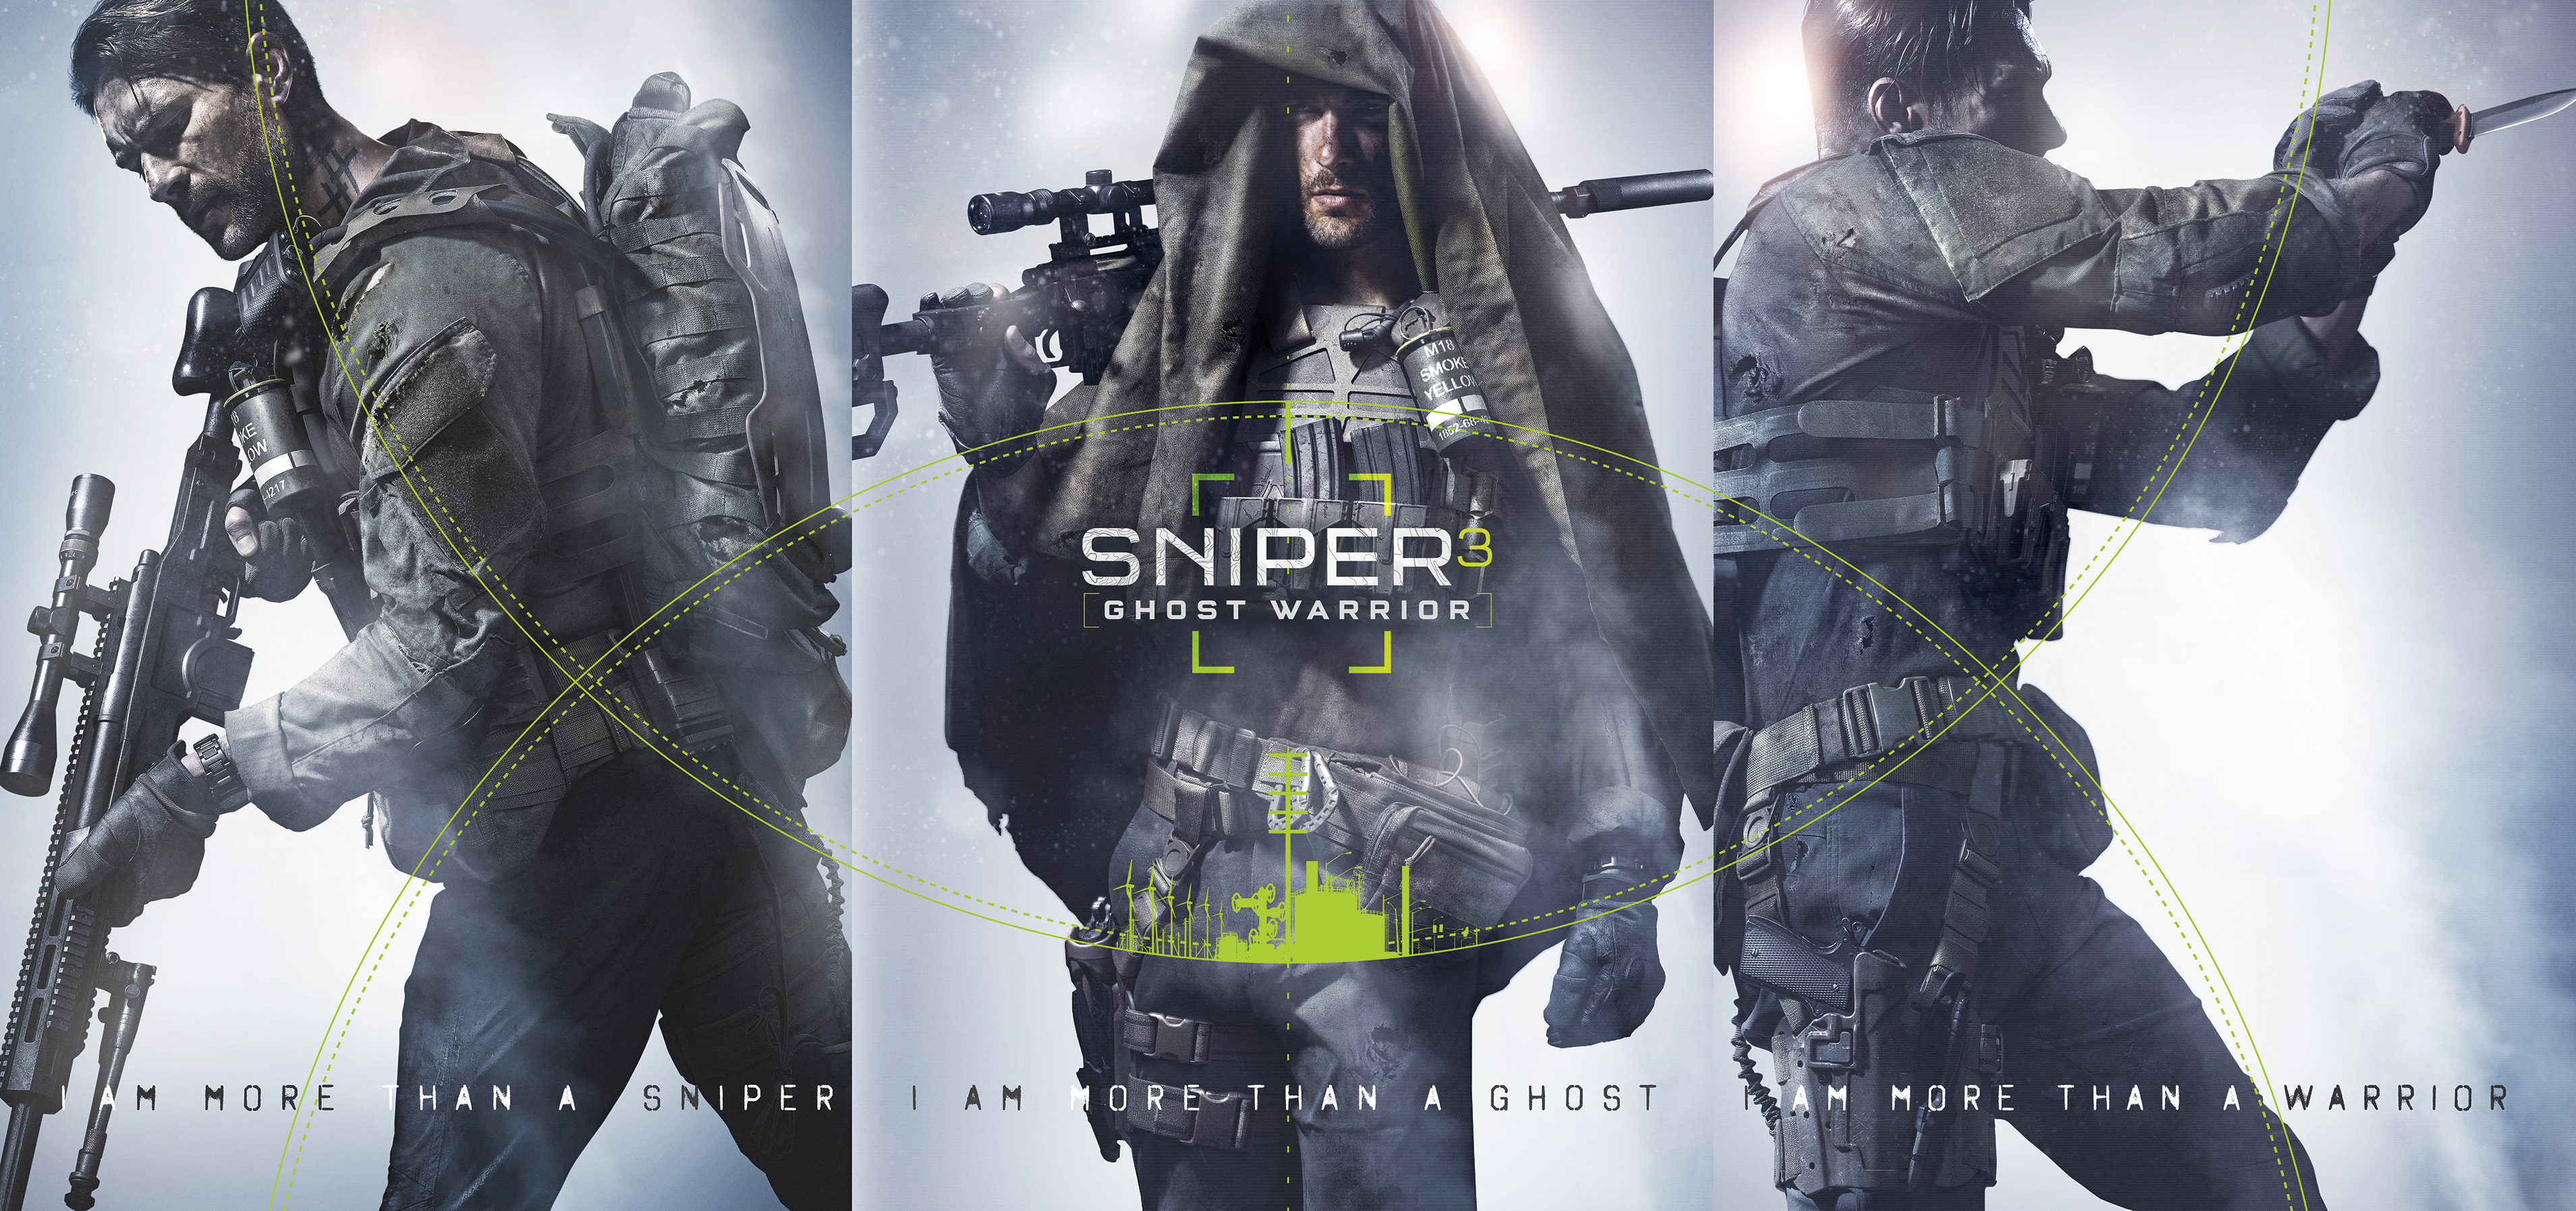 Sniper Ghost Warrior 3 Screenshots